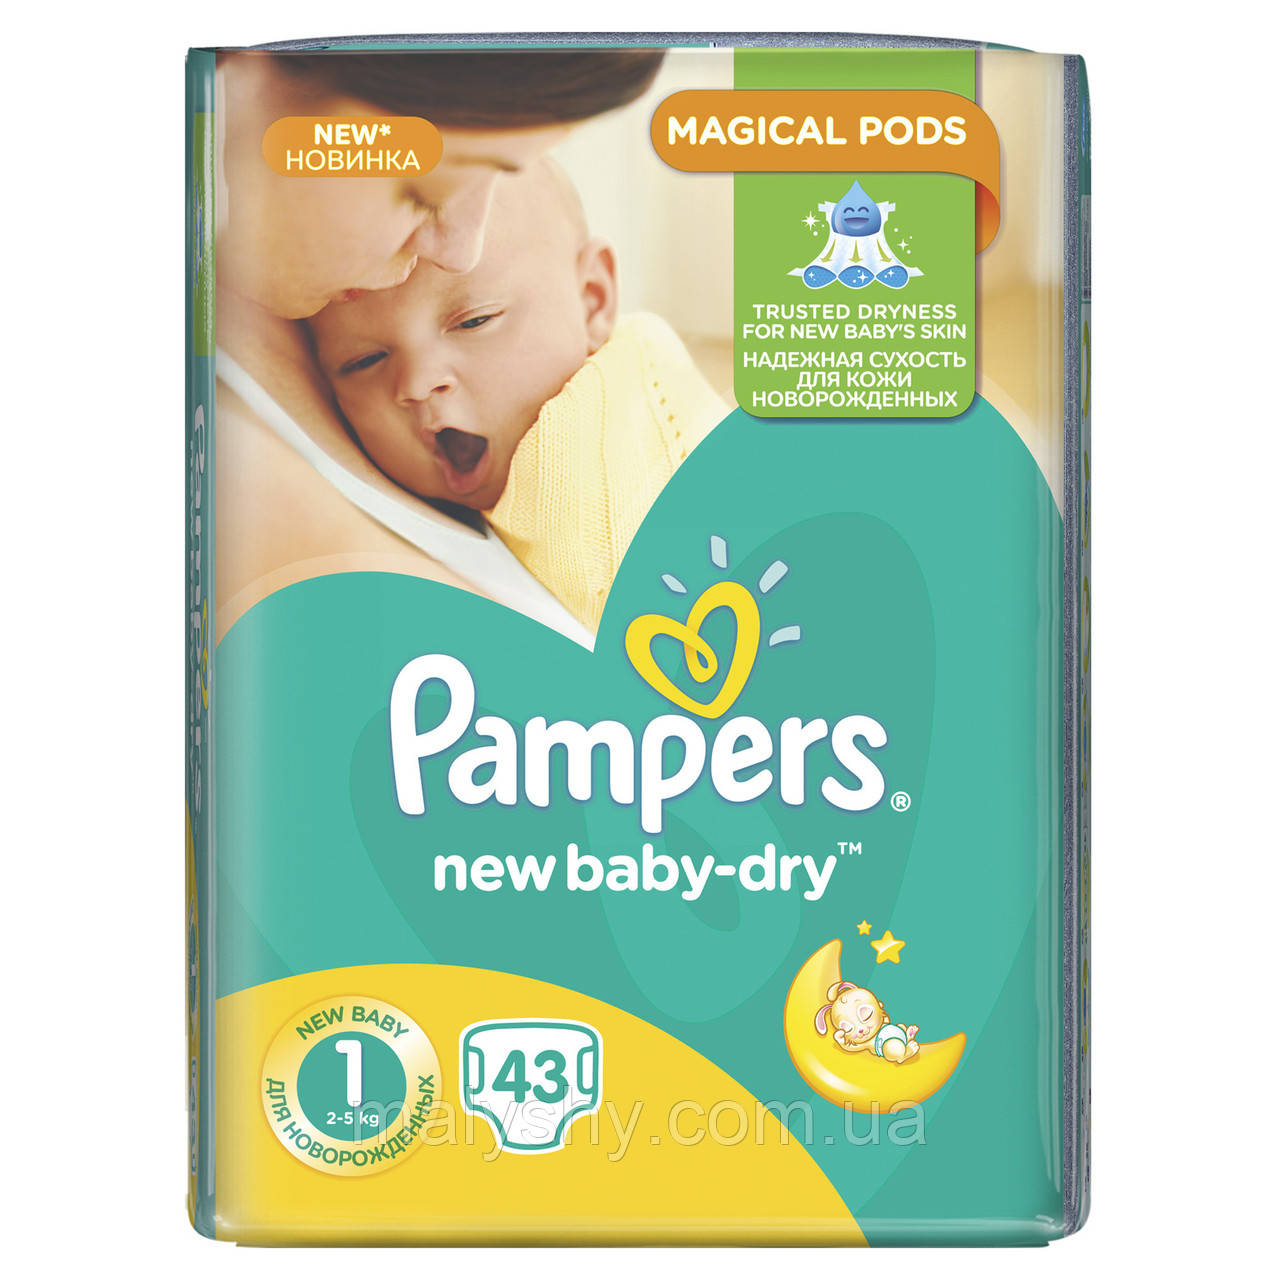 Подгузники pampers new baby dry размер 1